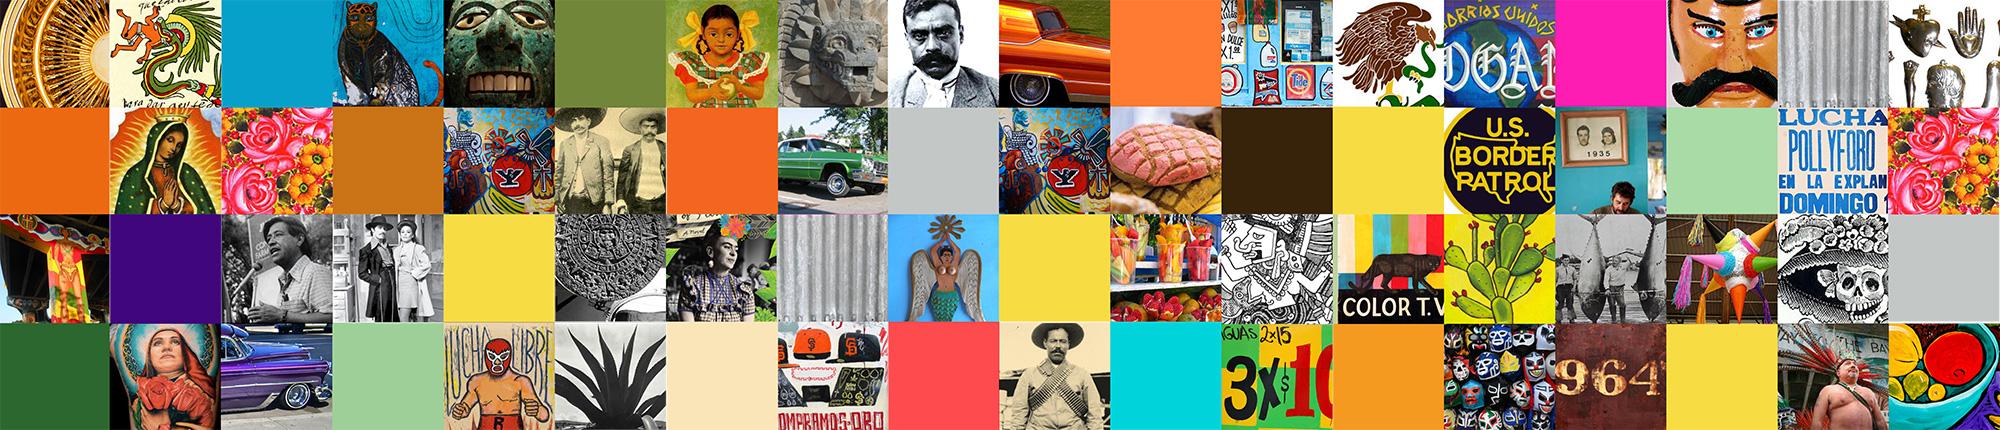 ron-miriello-grafico-barrio-logan-posters-san-diego-community-design-Miriello-branding-officina-08.jpg